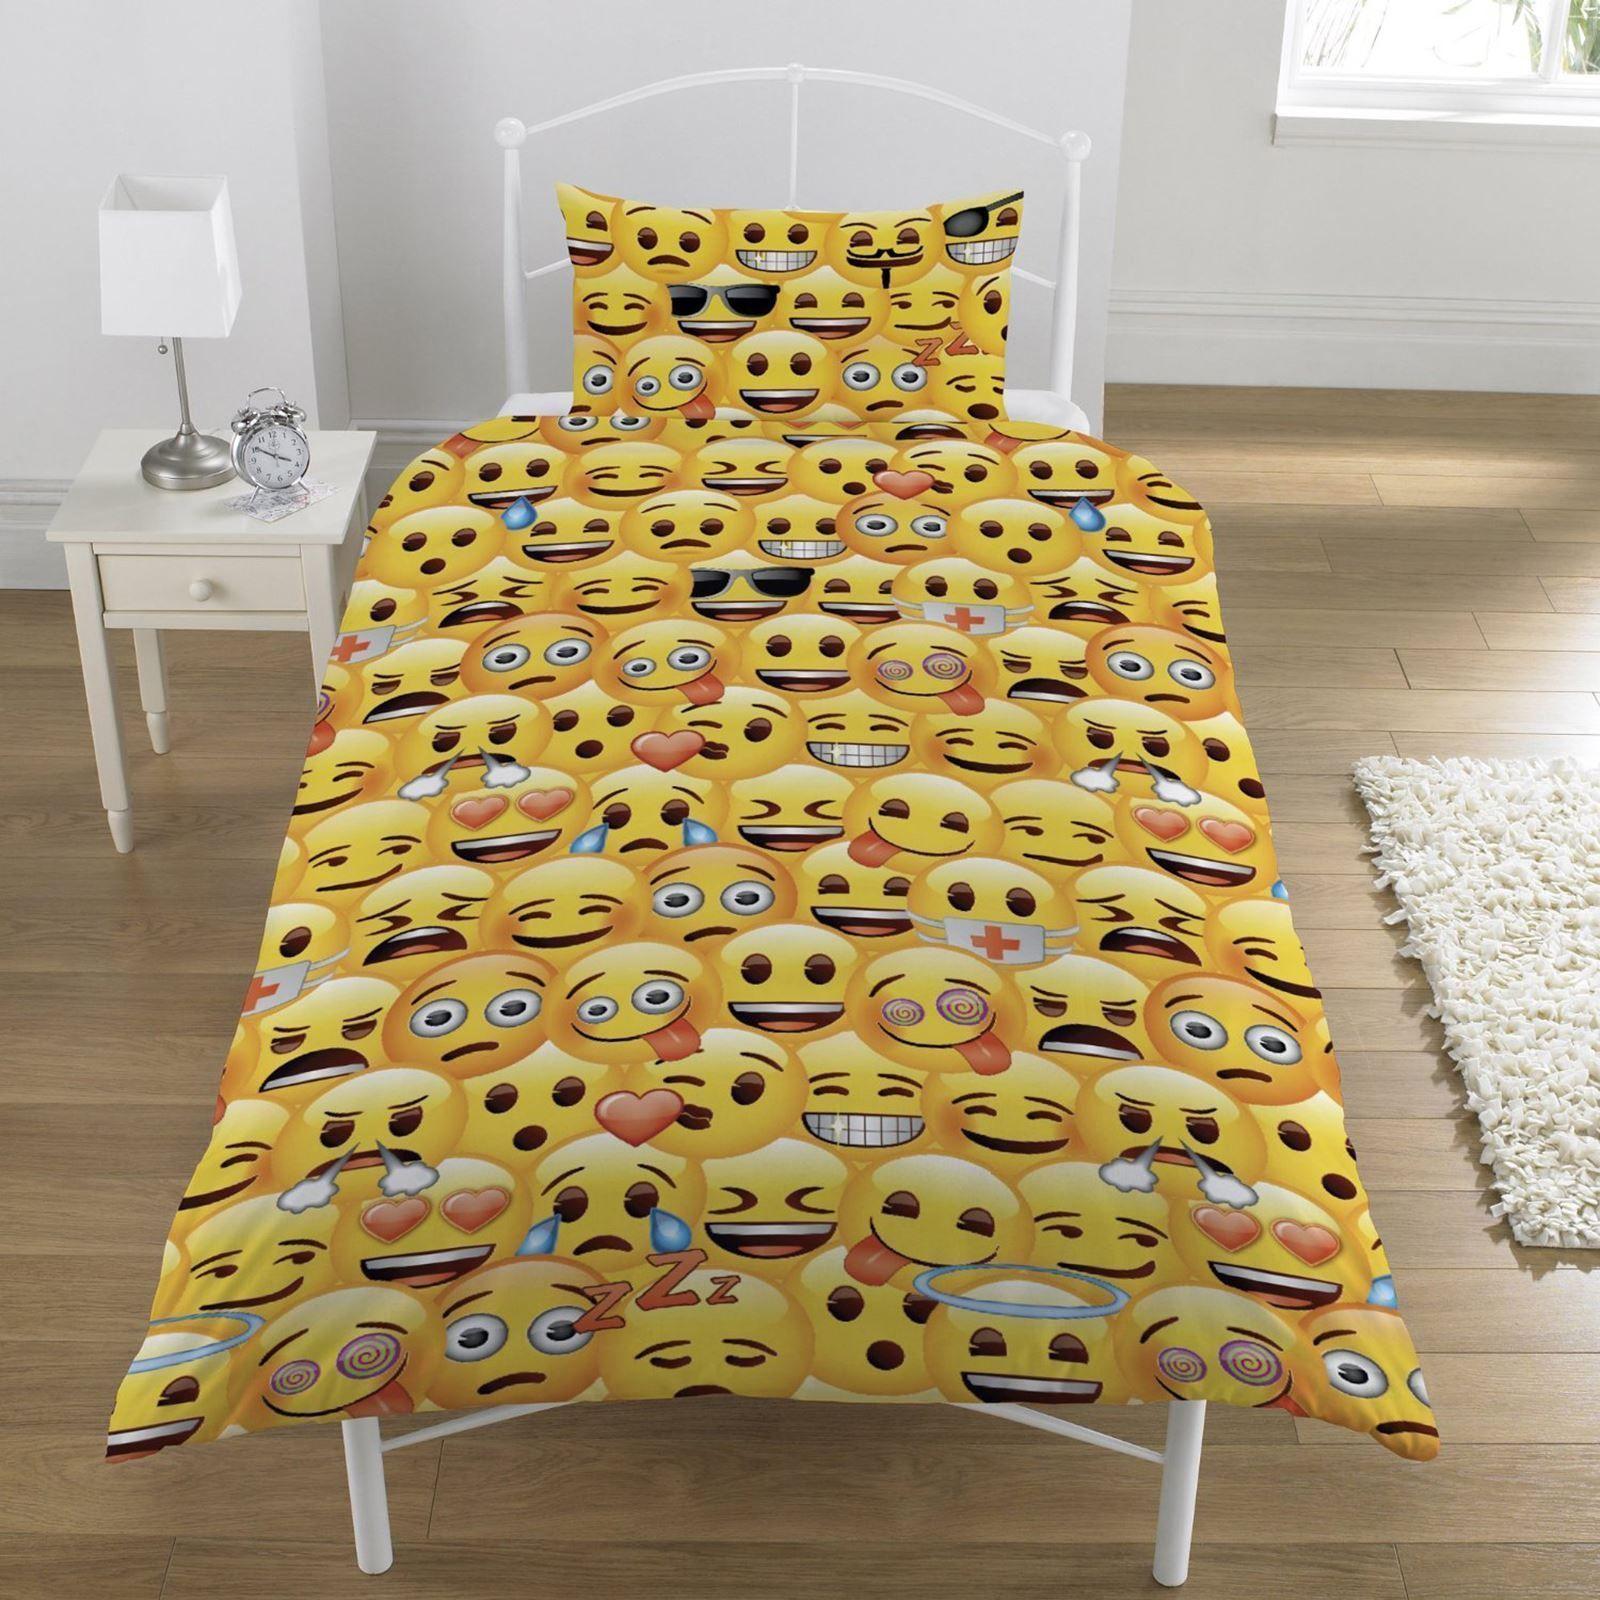 Emoji bedding sets u duvet covers home furniture u diy ebay